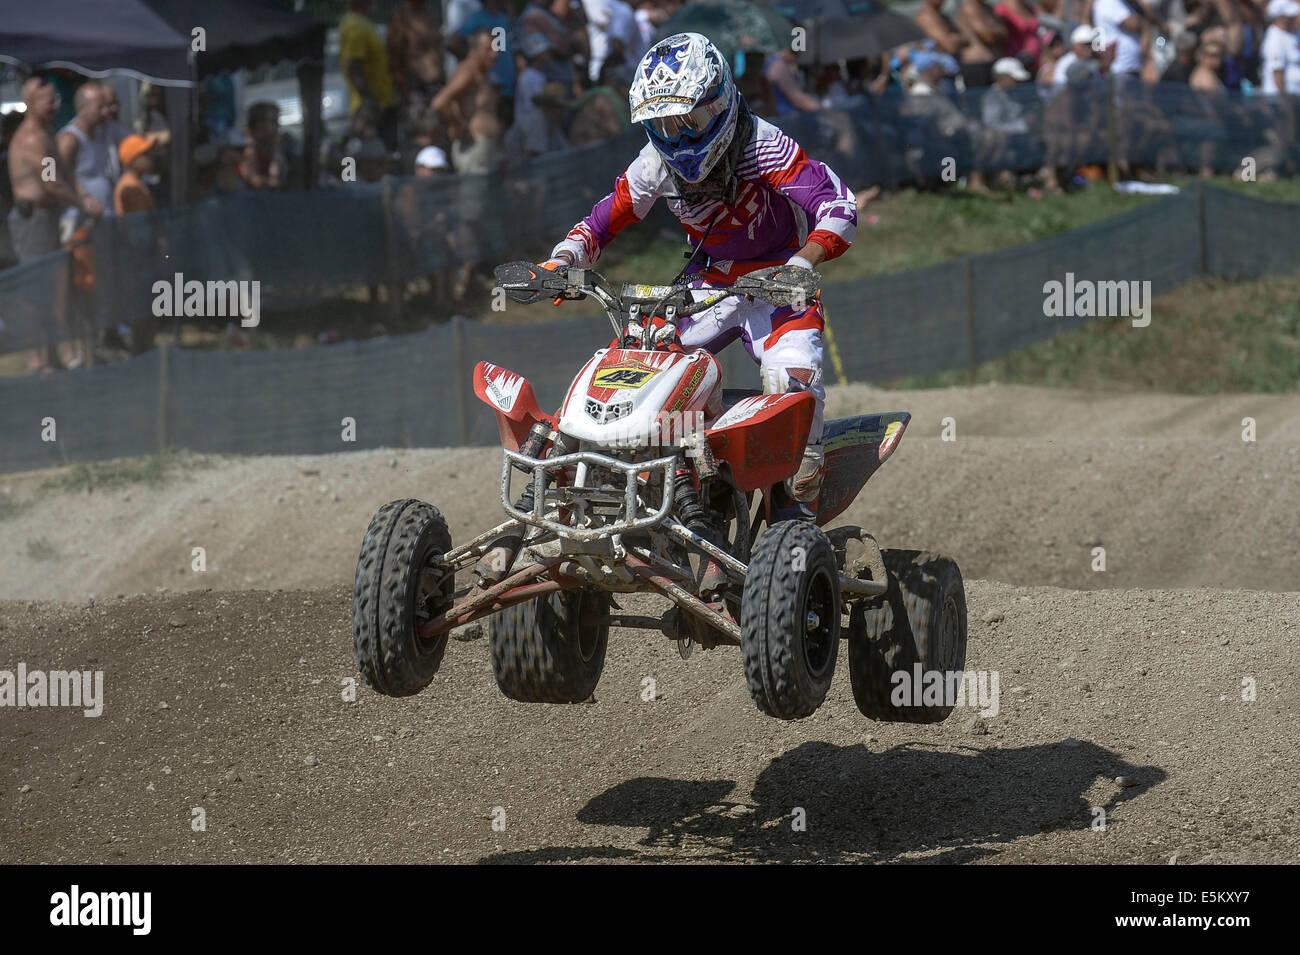 Kivioli. 3rd Aug, 2014. Daniil Vlasov of Russia competes during the MAXXIS Quadcross European Championship held - Stock Image